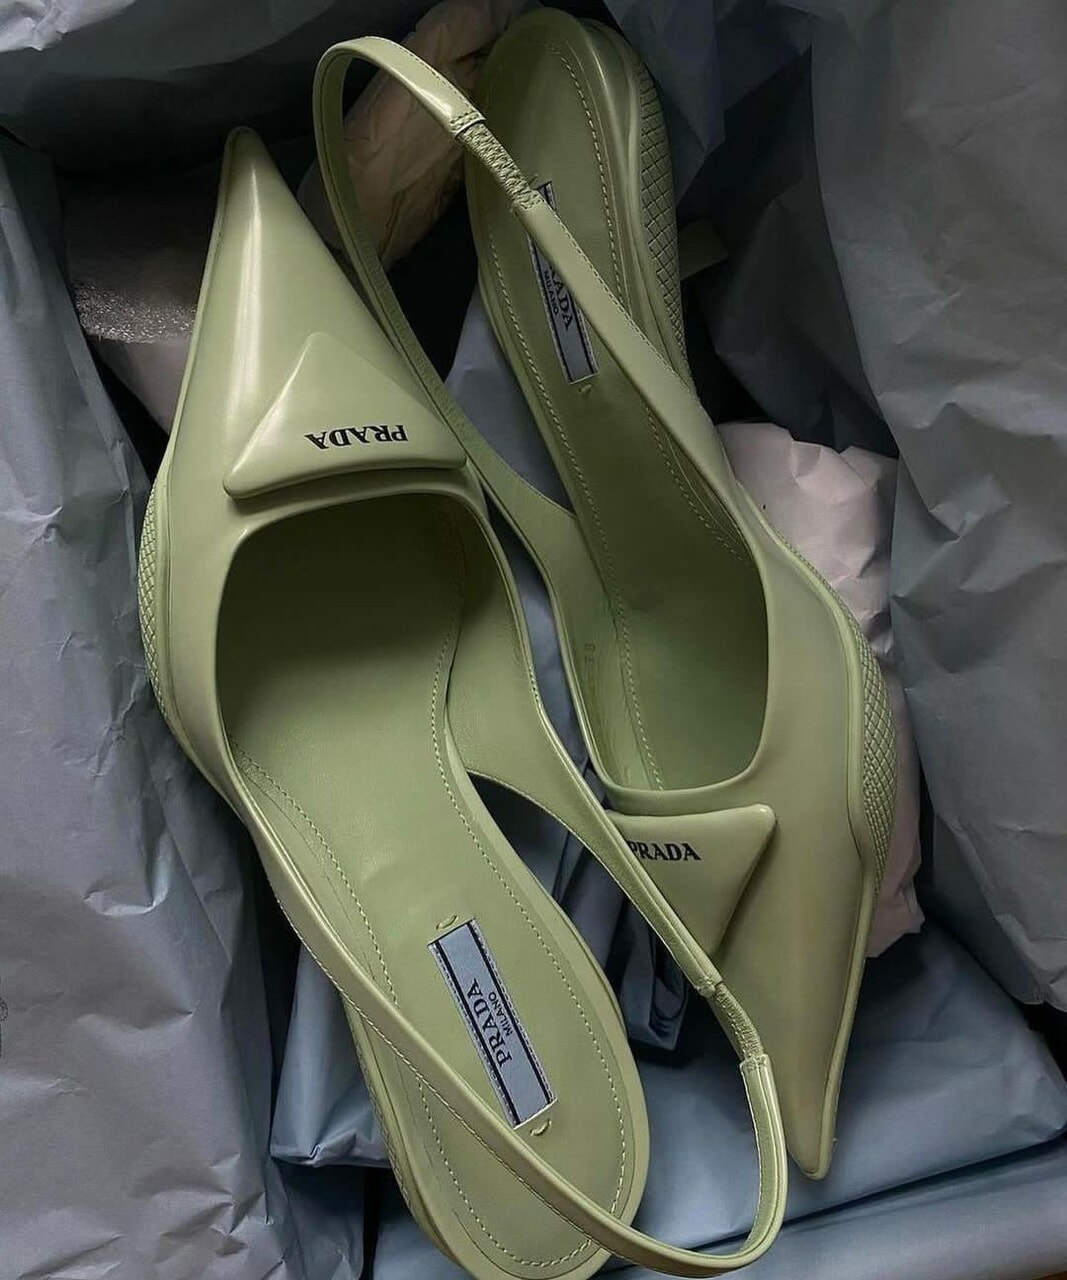 Prada, shoes, and fashion image